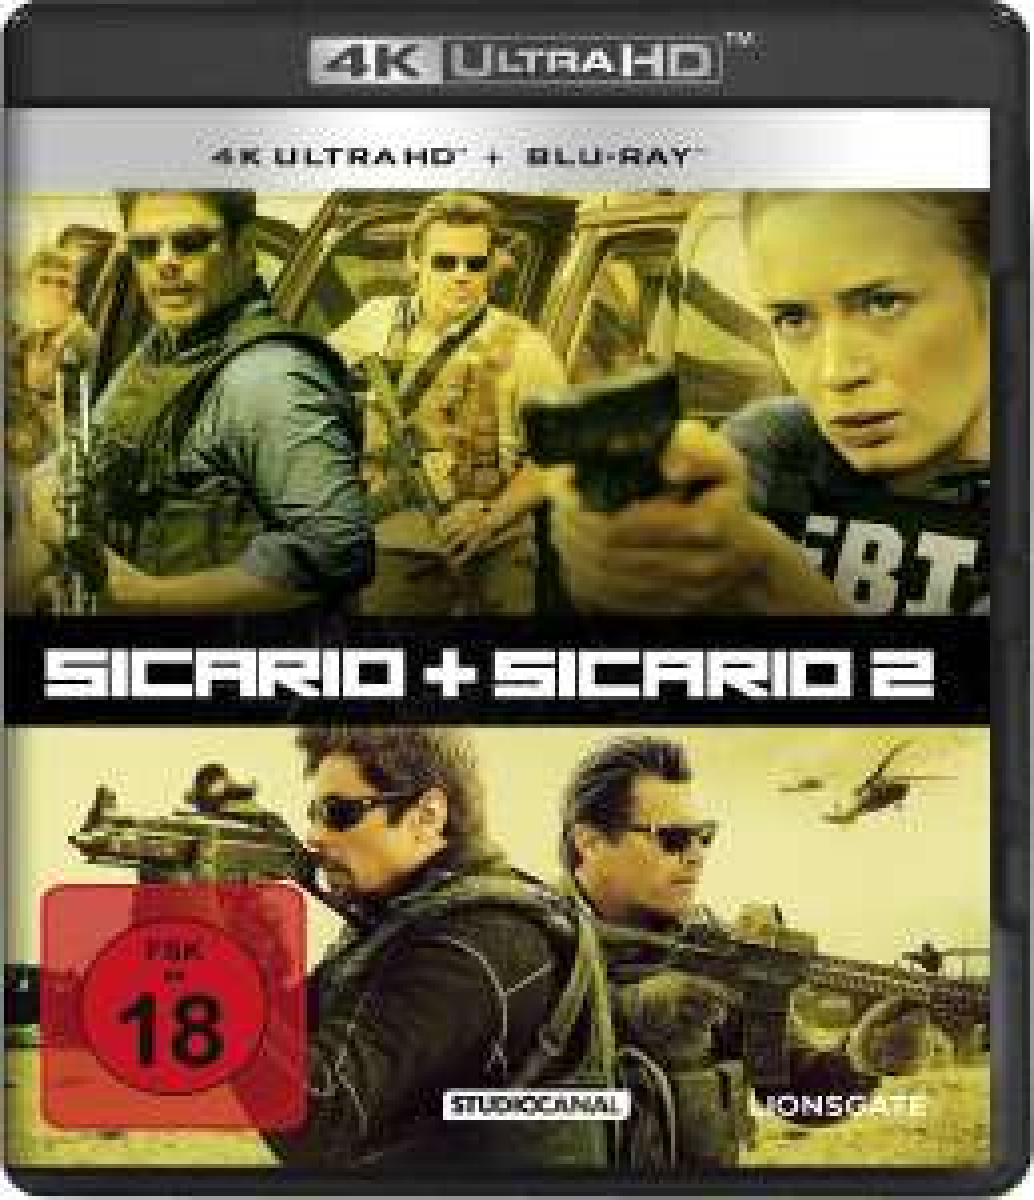 Sicario 1 & 2 4K Doppelset (4K UHD + Blu-ray) für 22,97€ (Amazon)